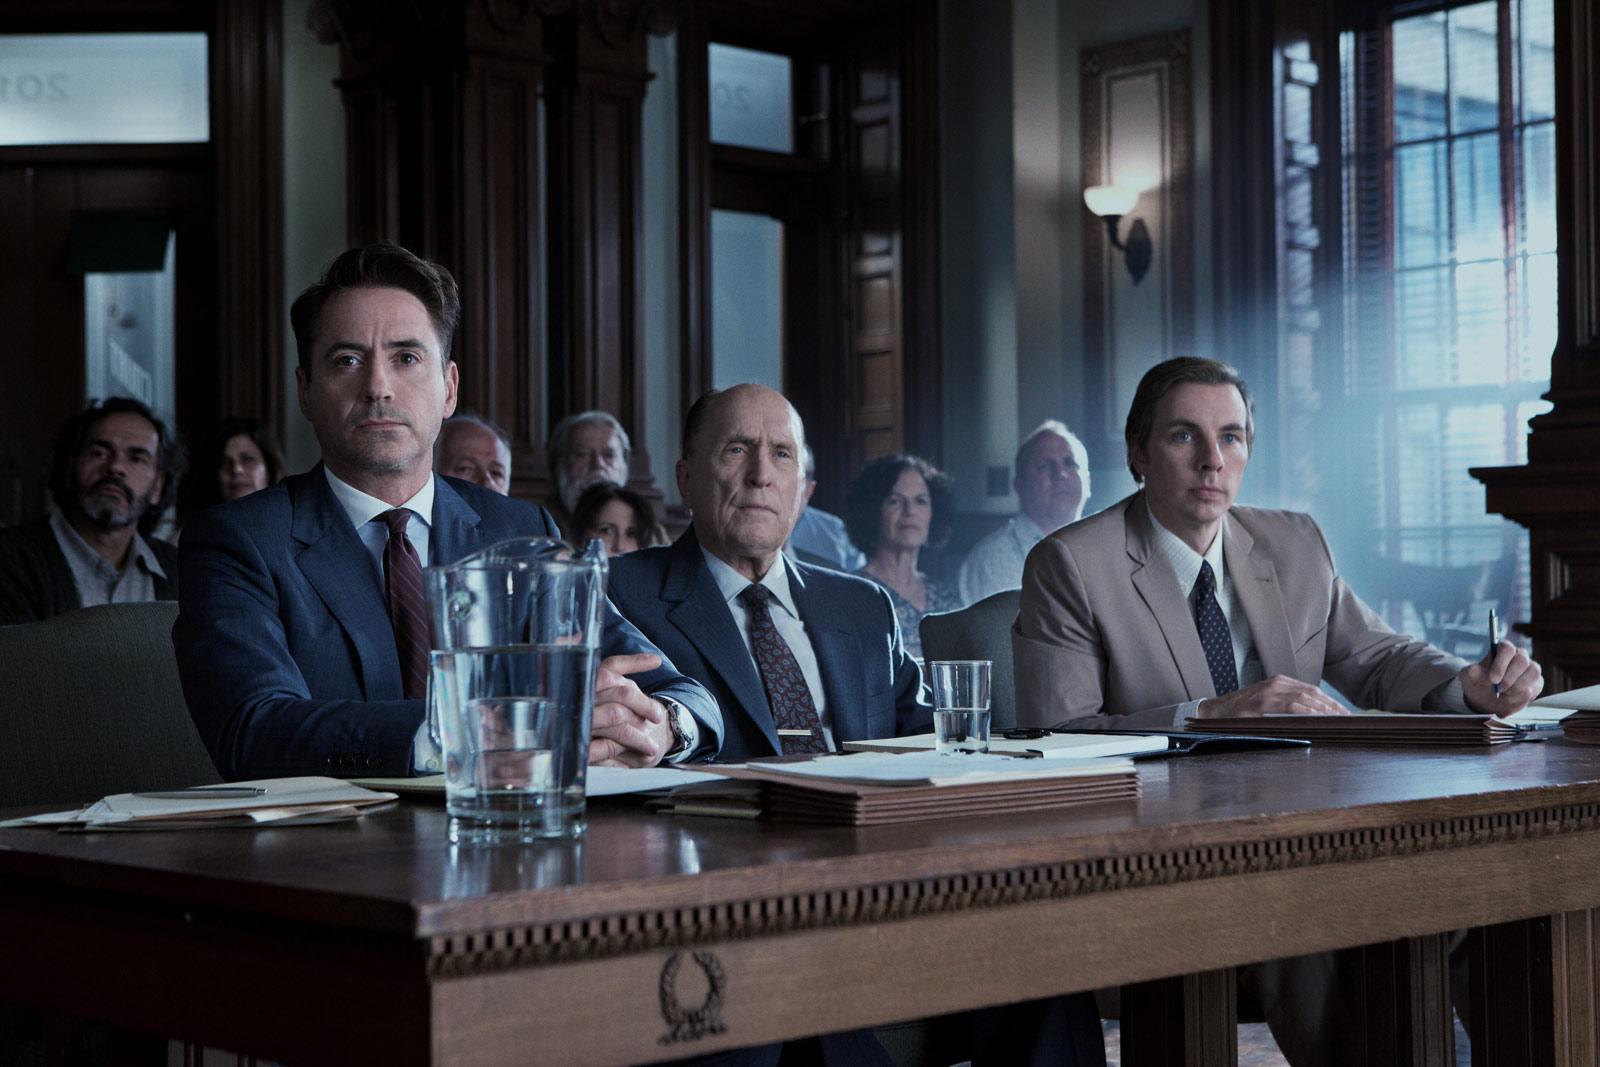 O juiz | Netflix